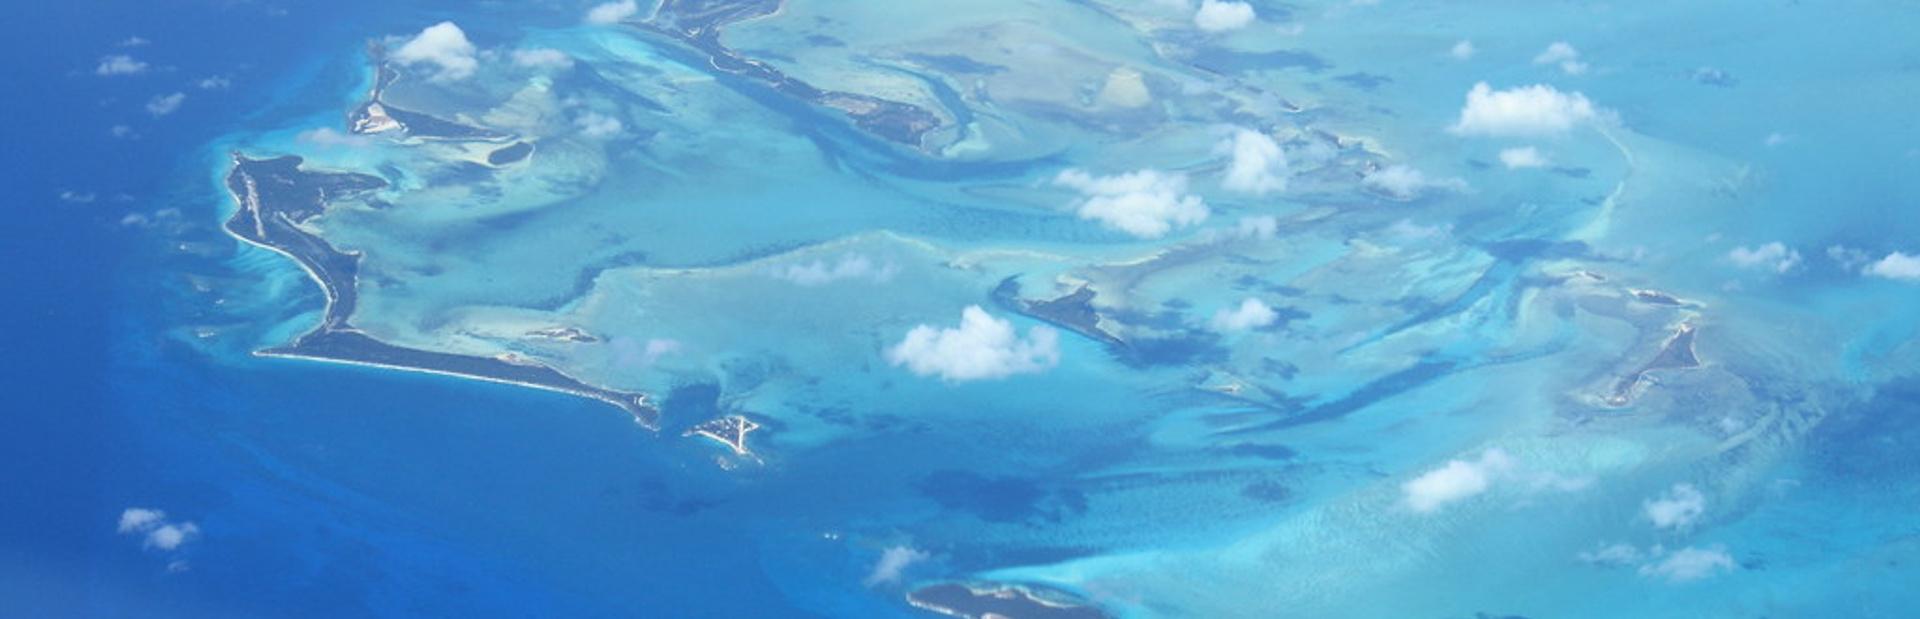 Berry Islands news photo